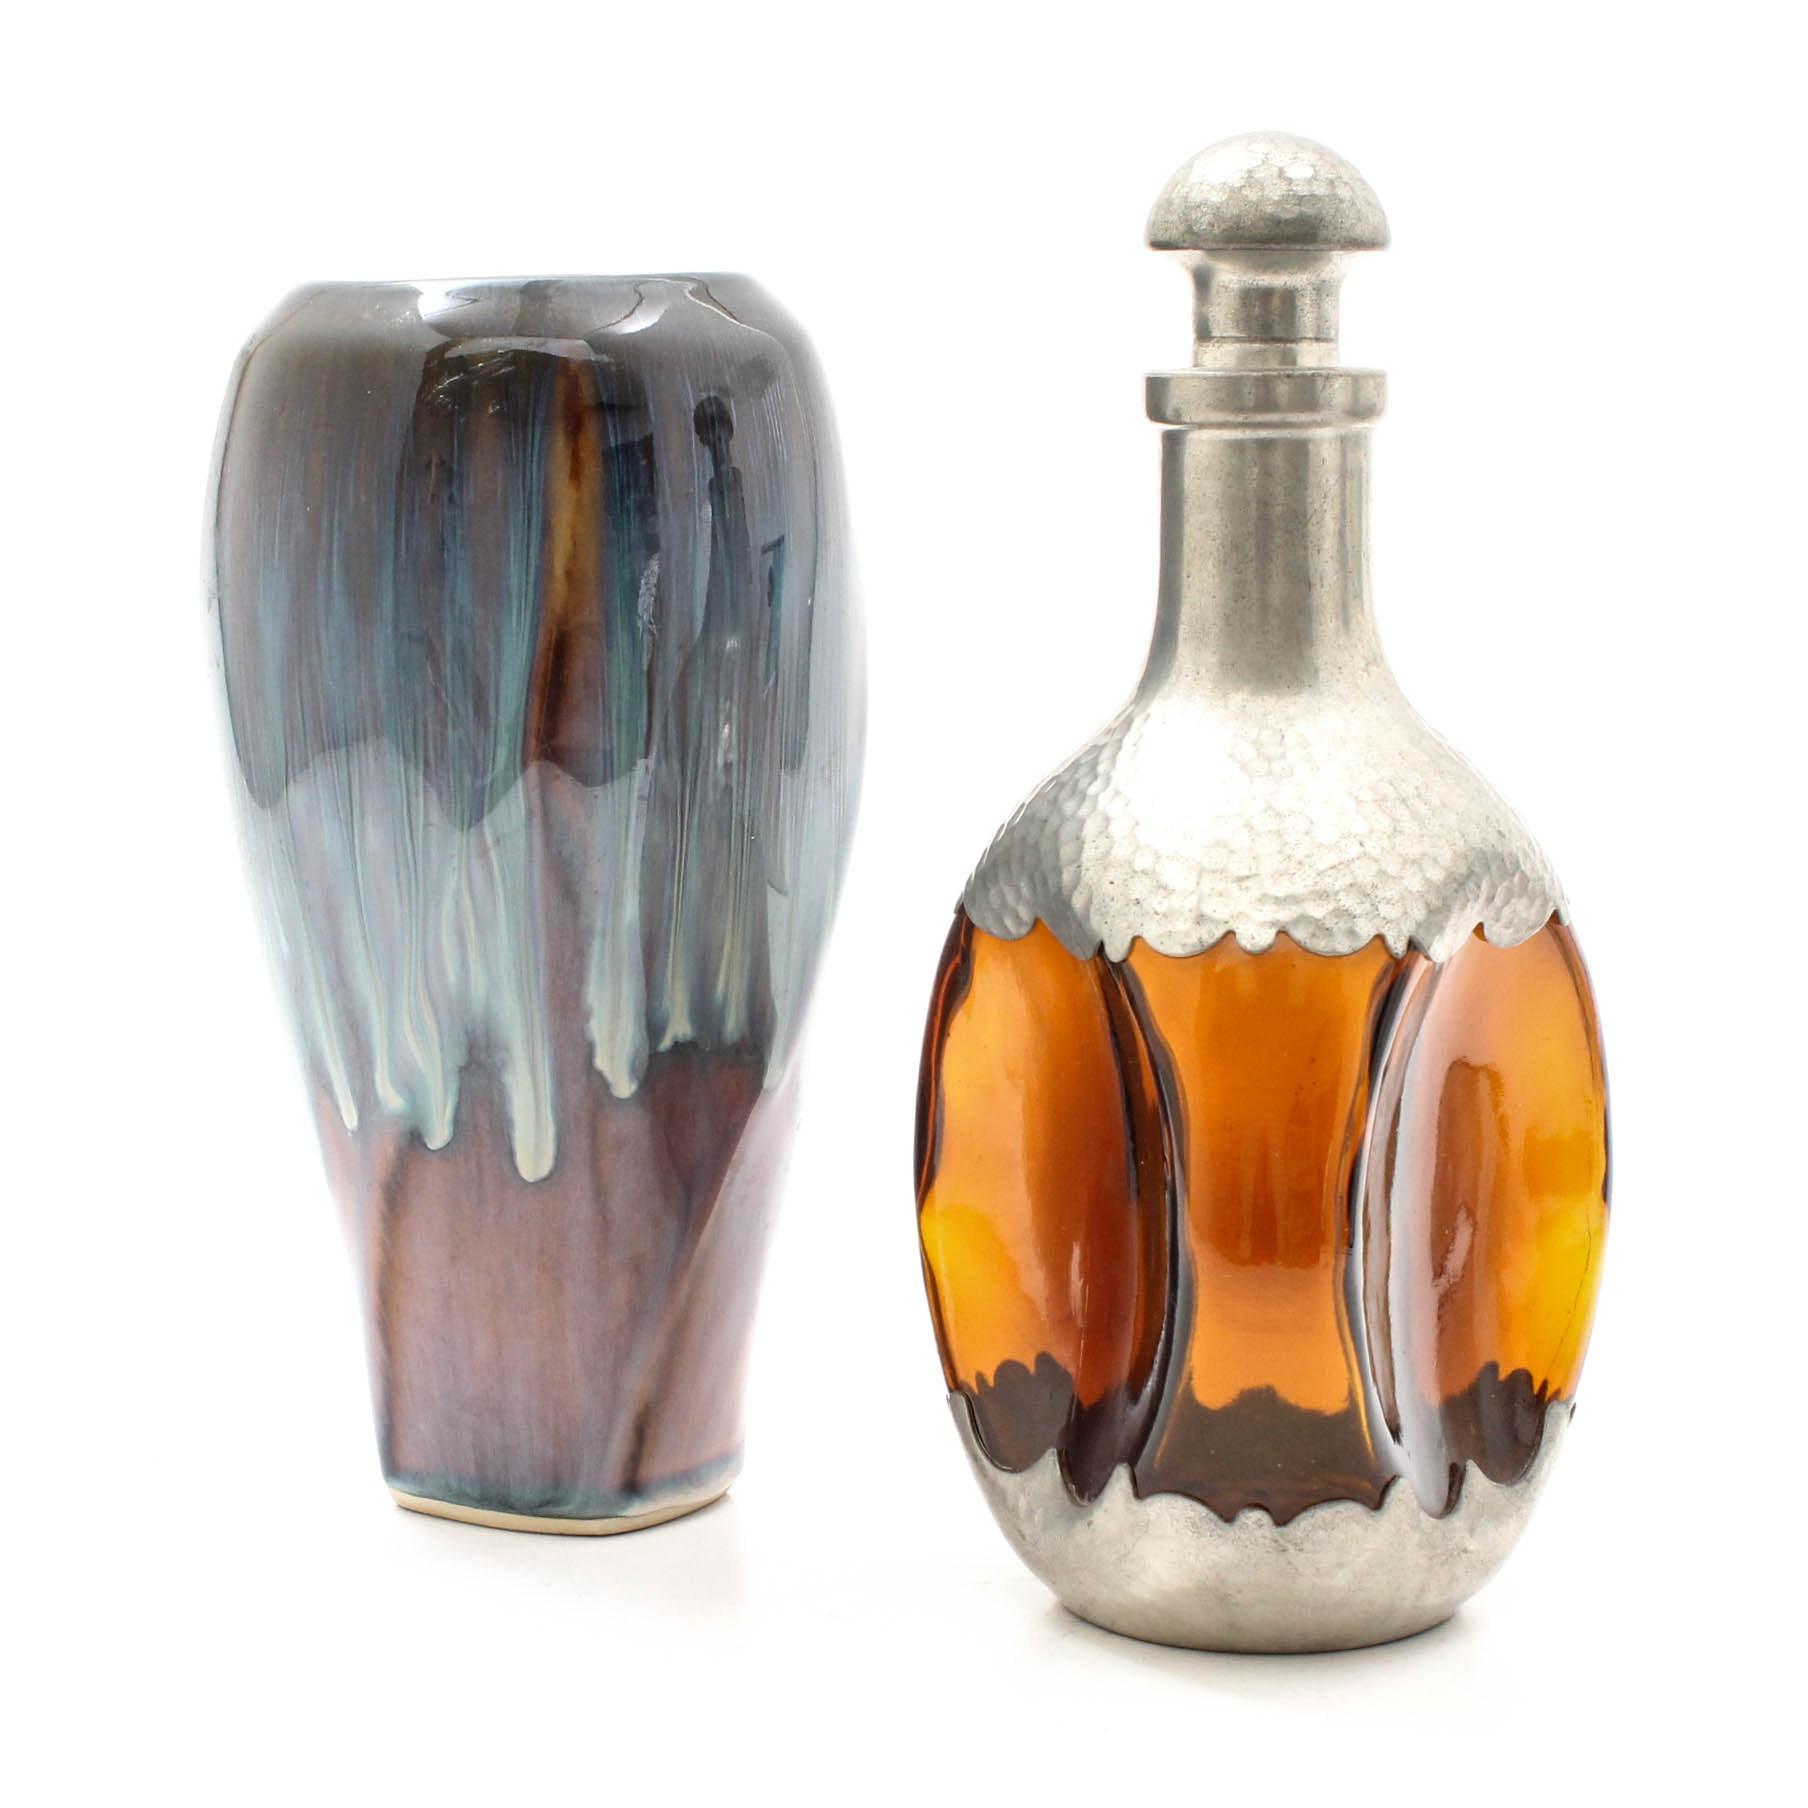 Royal Holland Daalderop Pewter Decanter and Artisan Vase